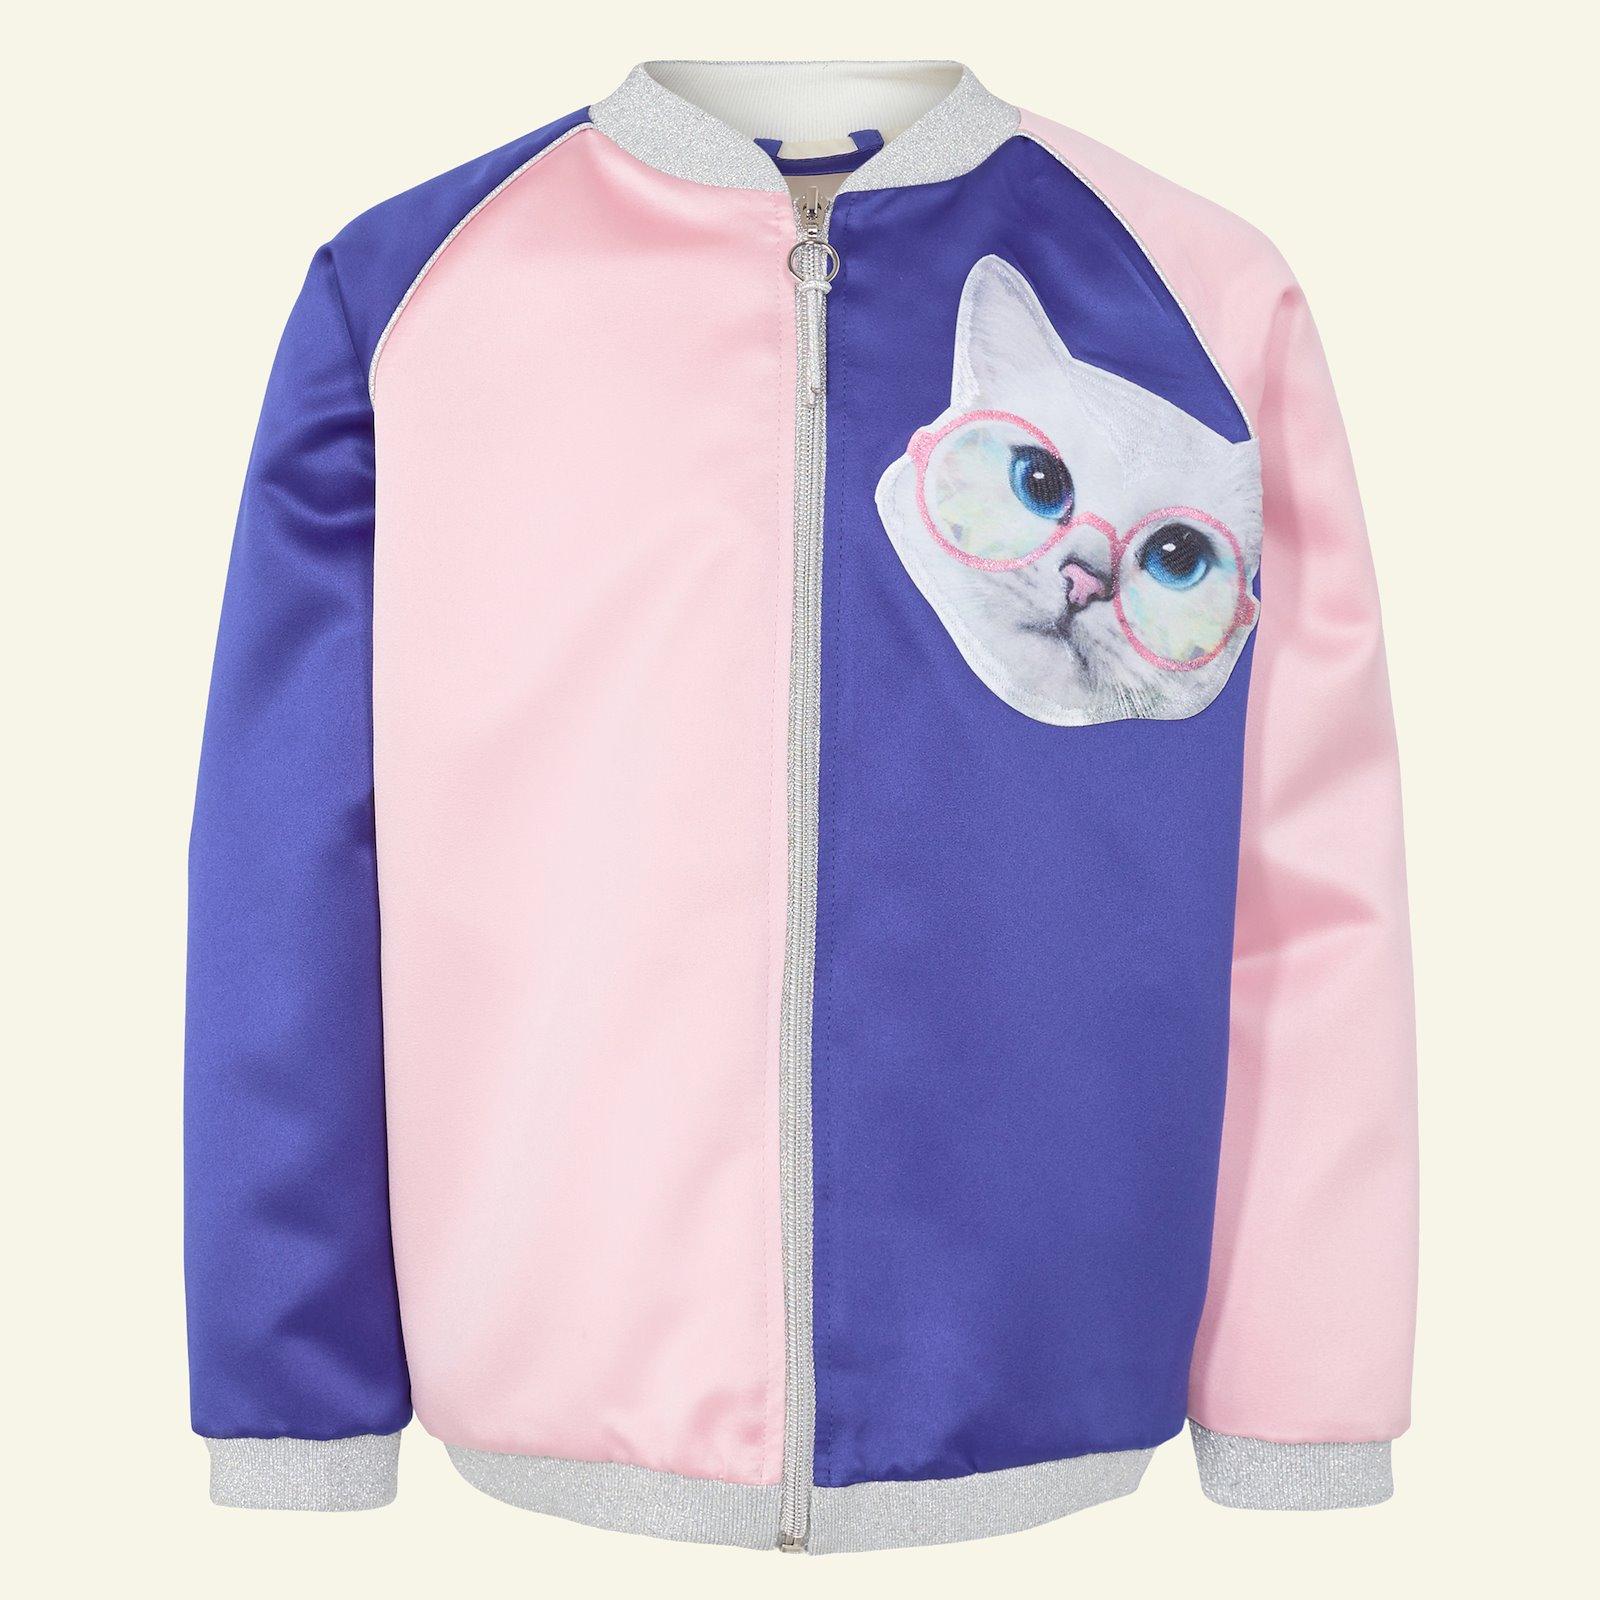 Bomber jacket, 122/7y p64017_620417_620094_96111_72078_26436_sskit